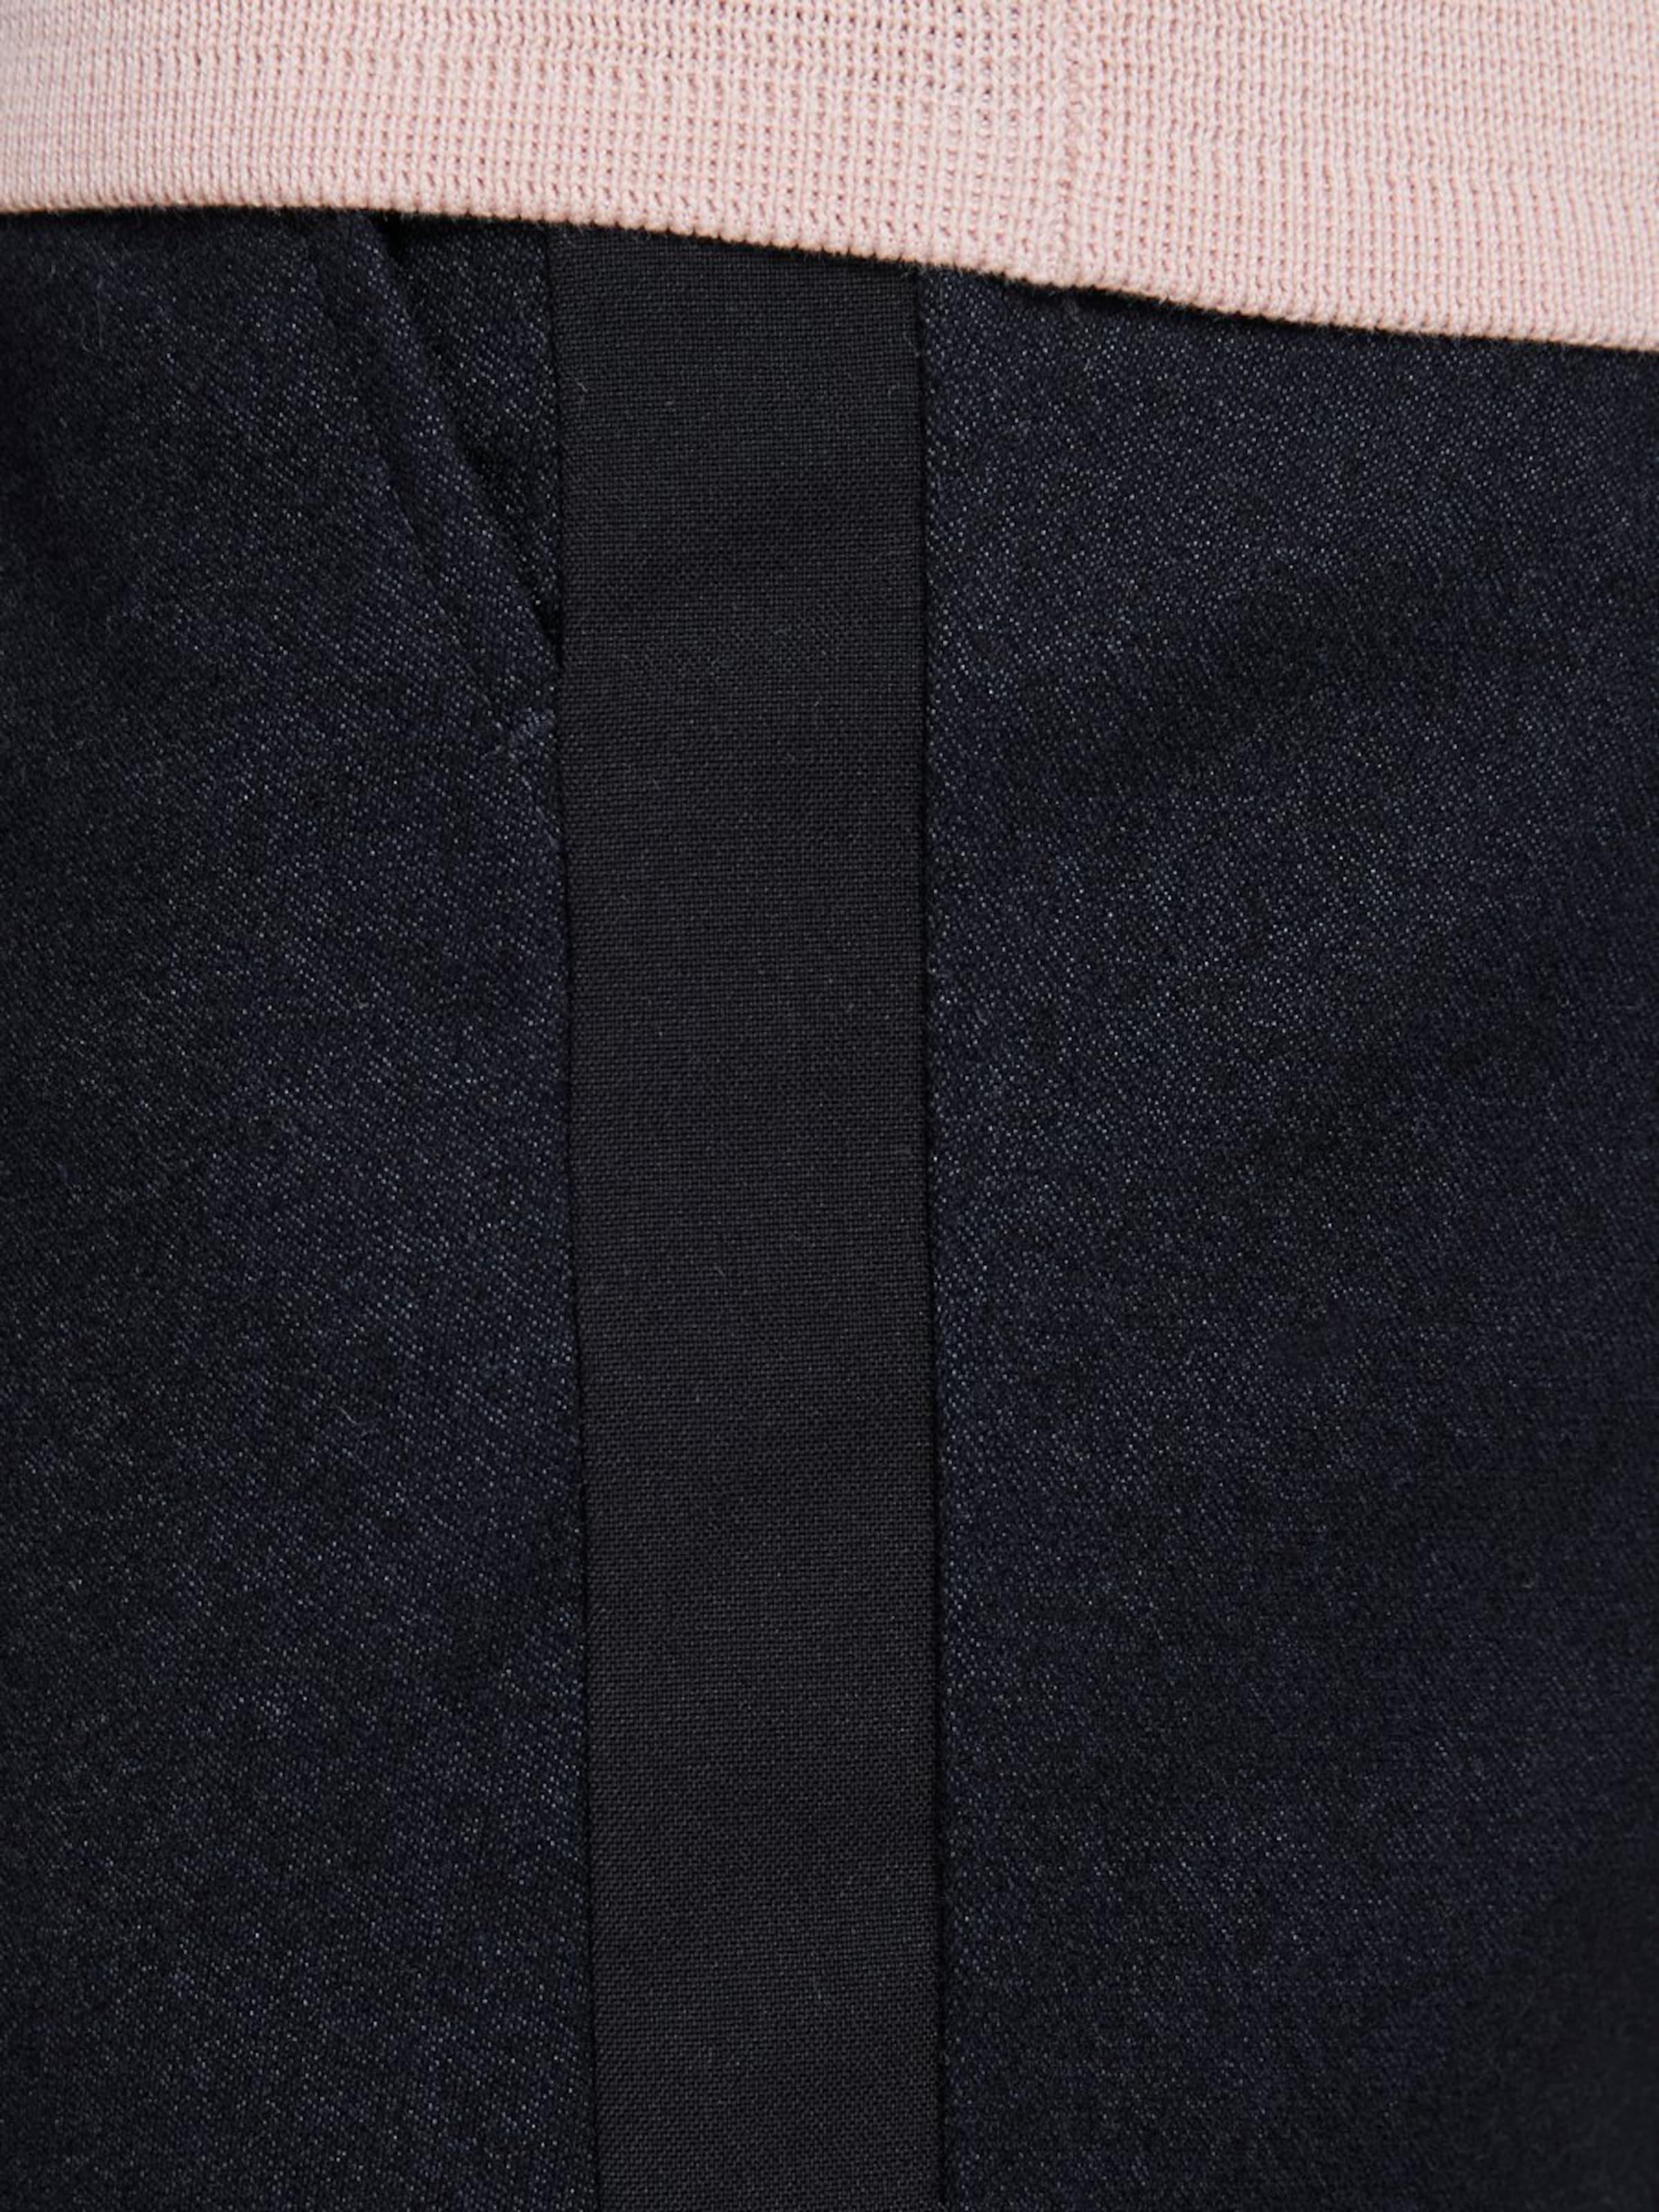 Sweathose Nachtblau Jackamp; In Jones Jones Jackamp; 13cuKTFJl